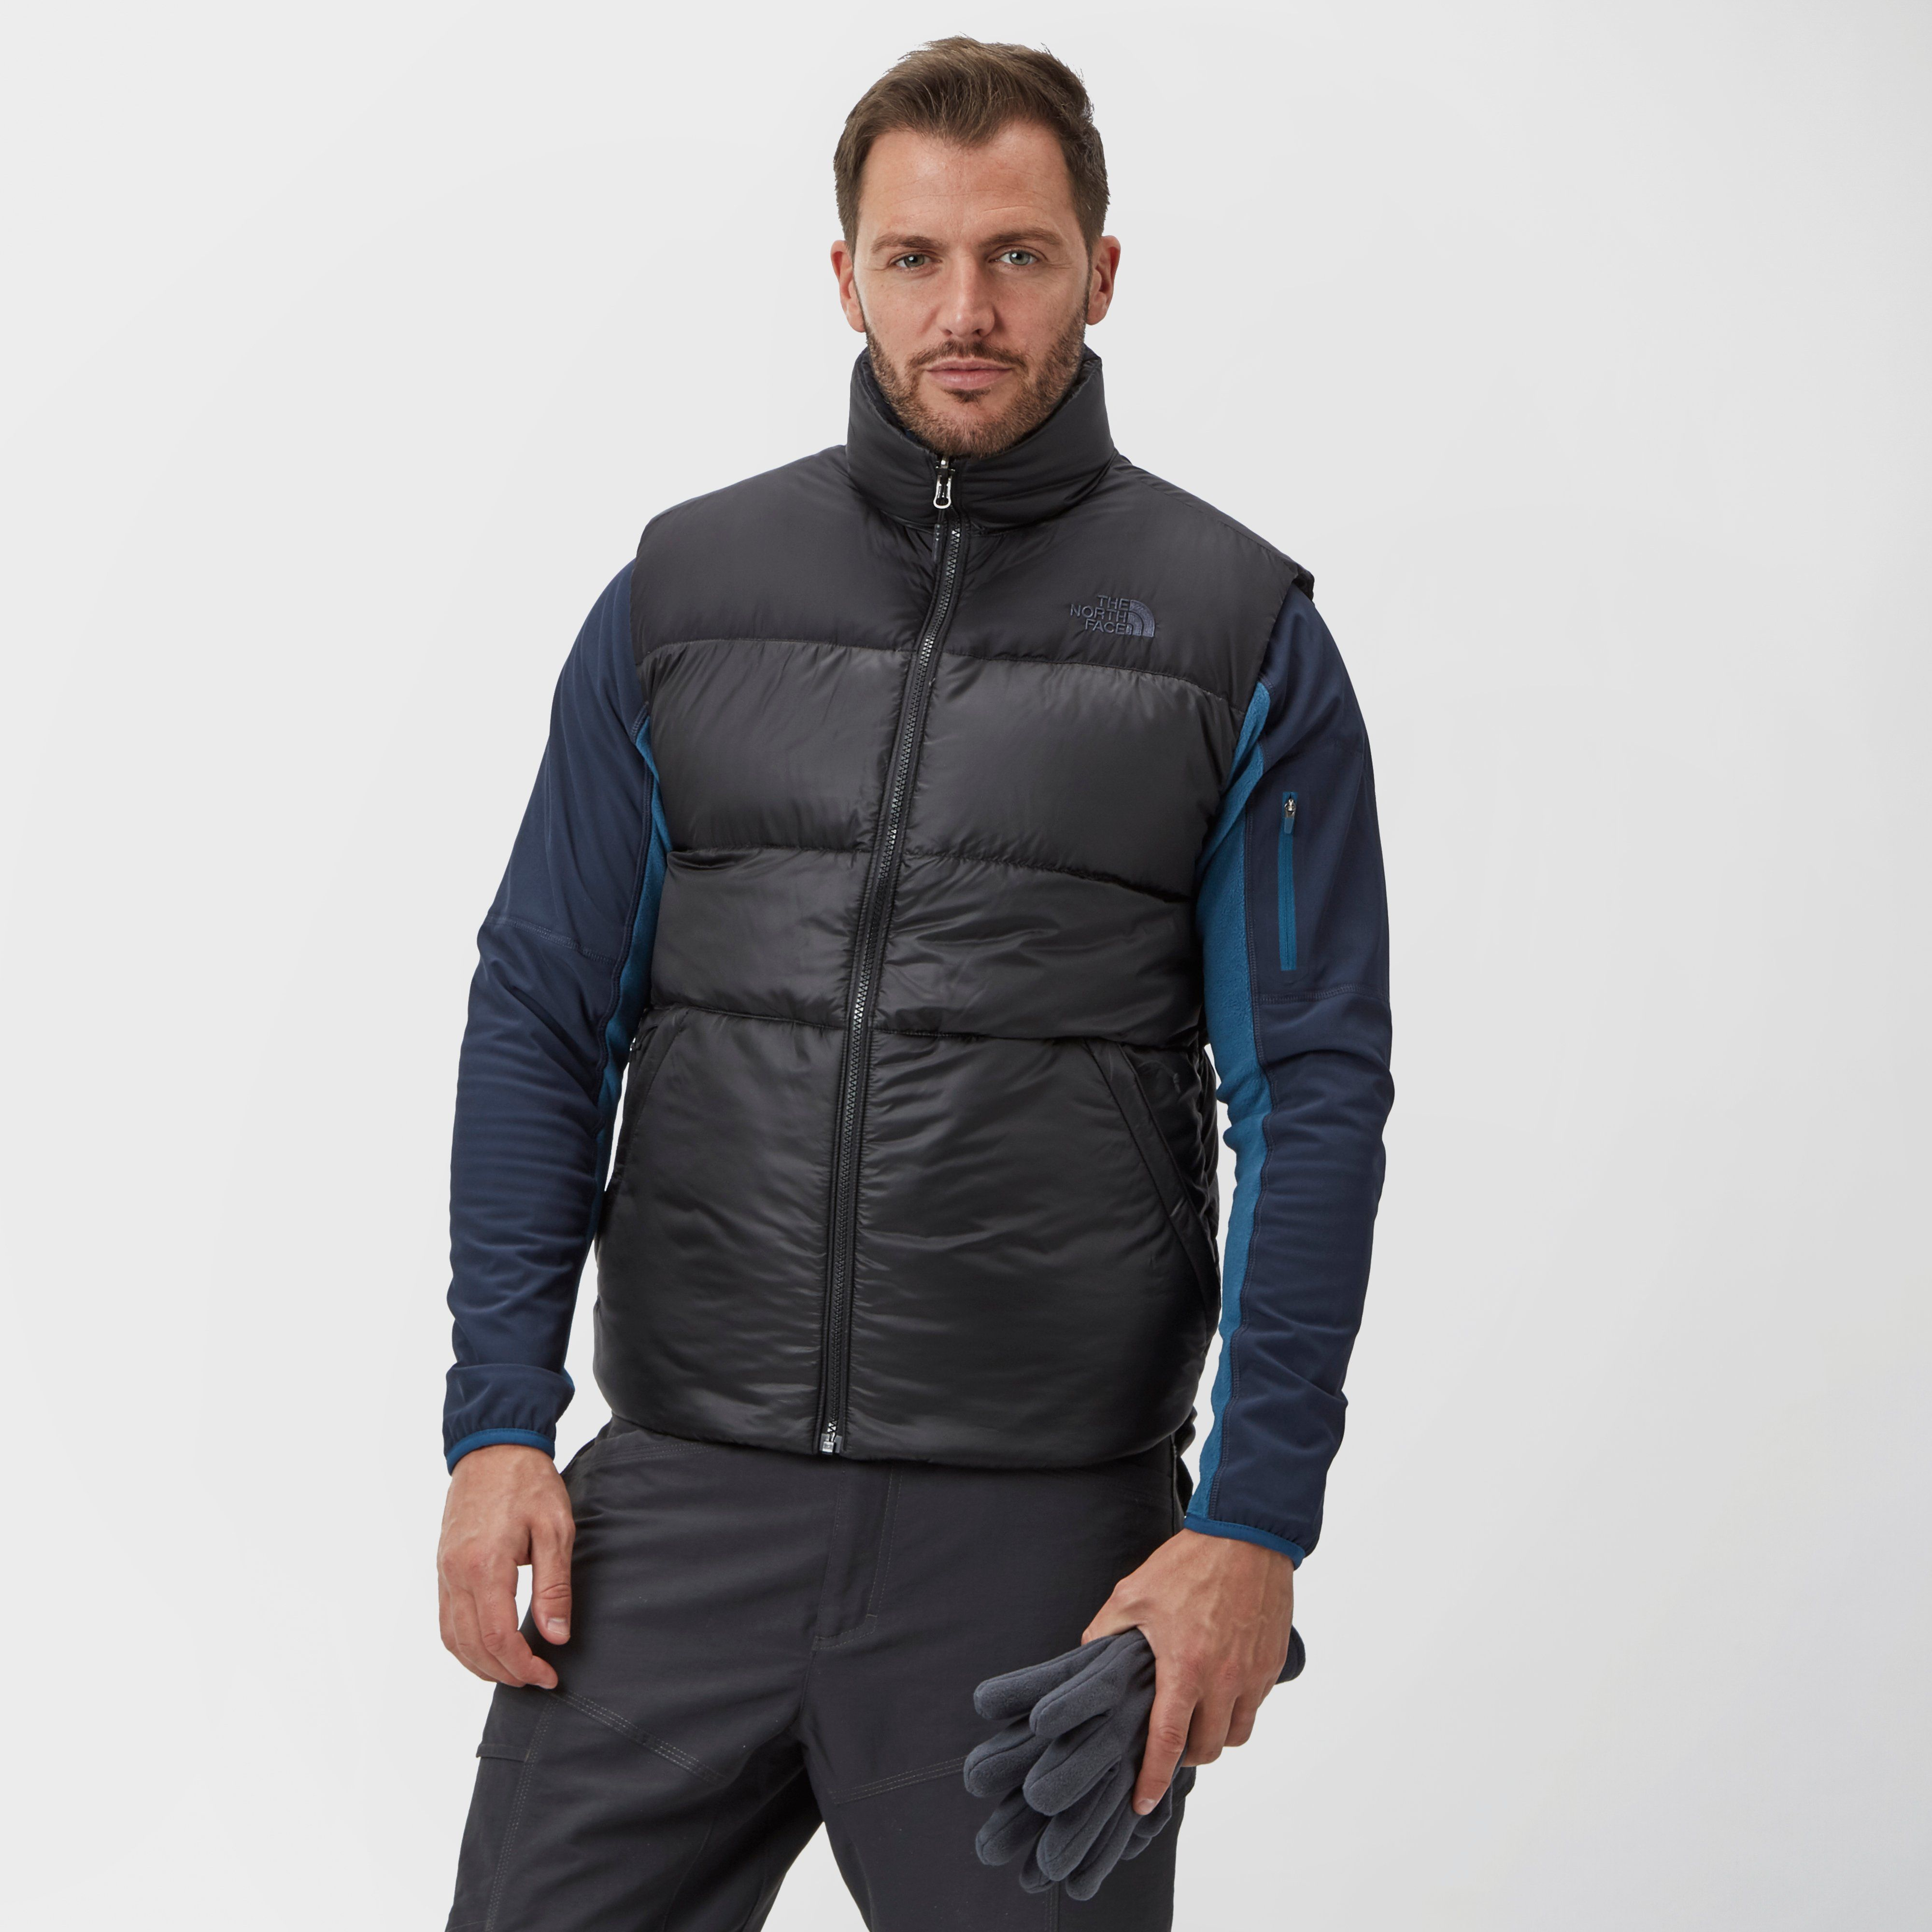 THE NORTH FACE Men's Nuptse III Vest